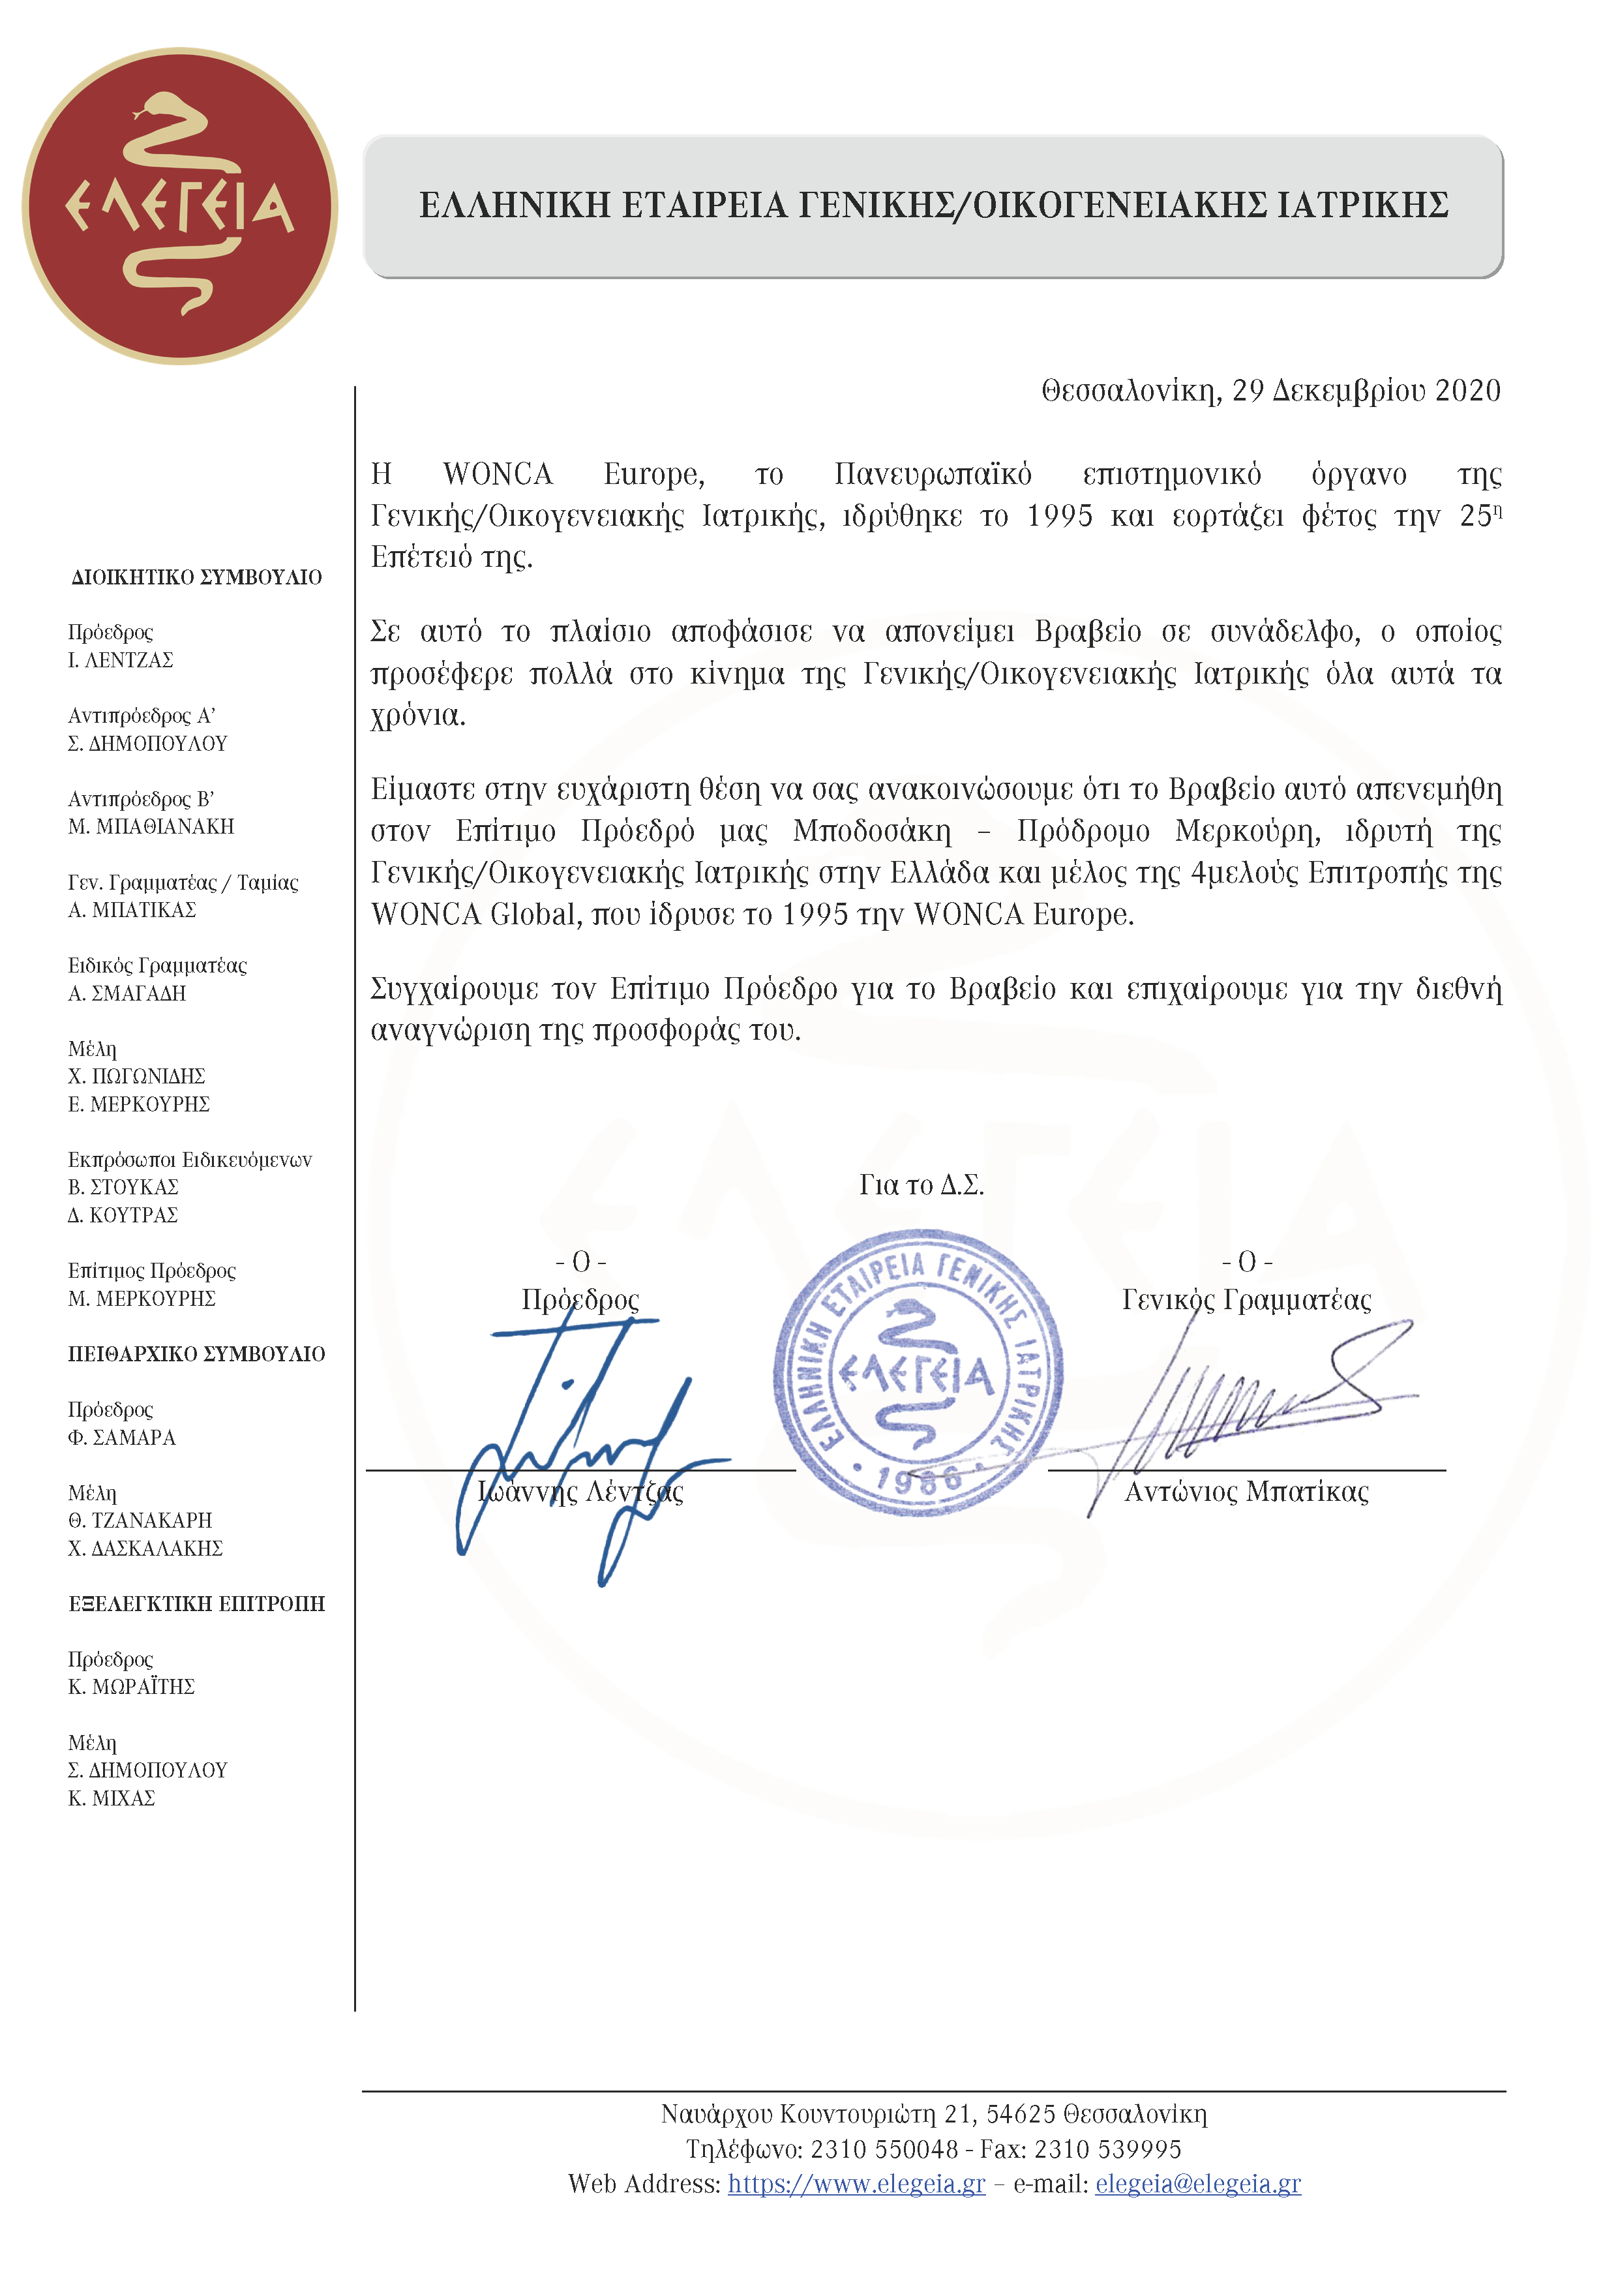 ELEGEIA-Letter